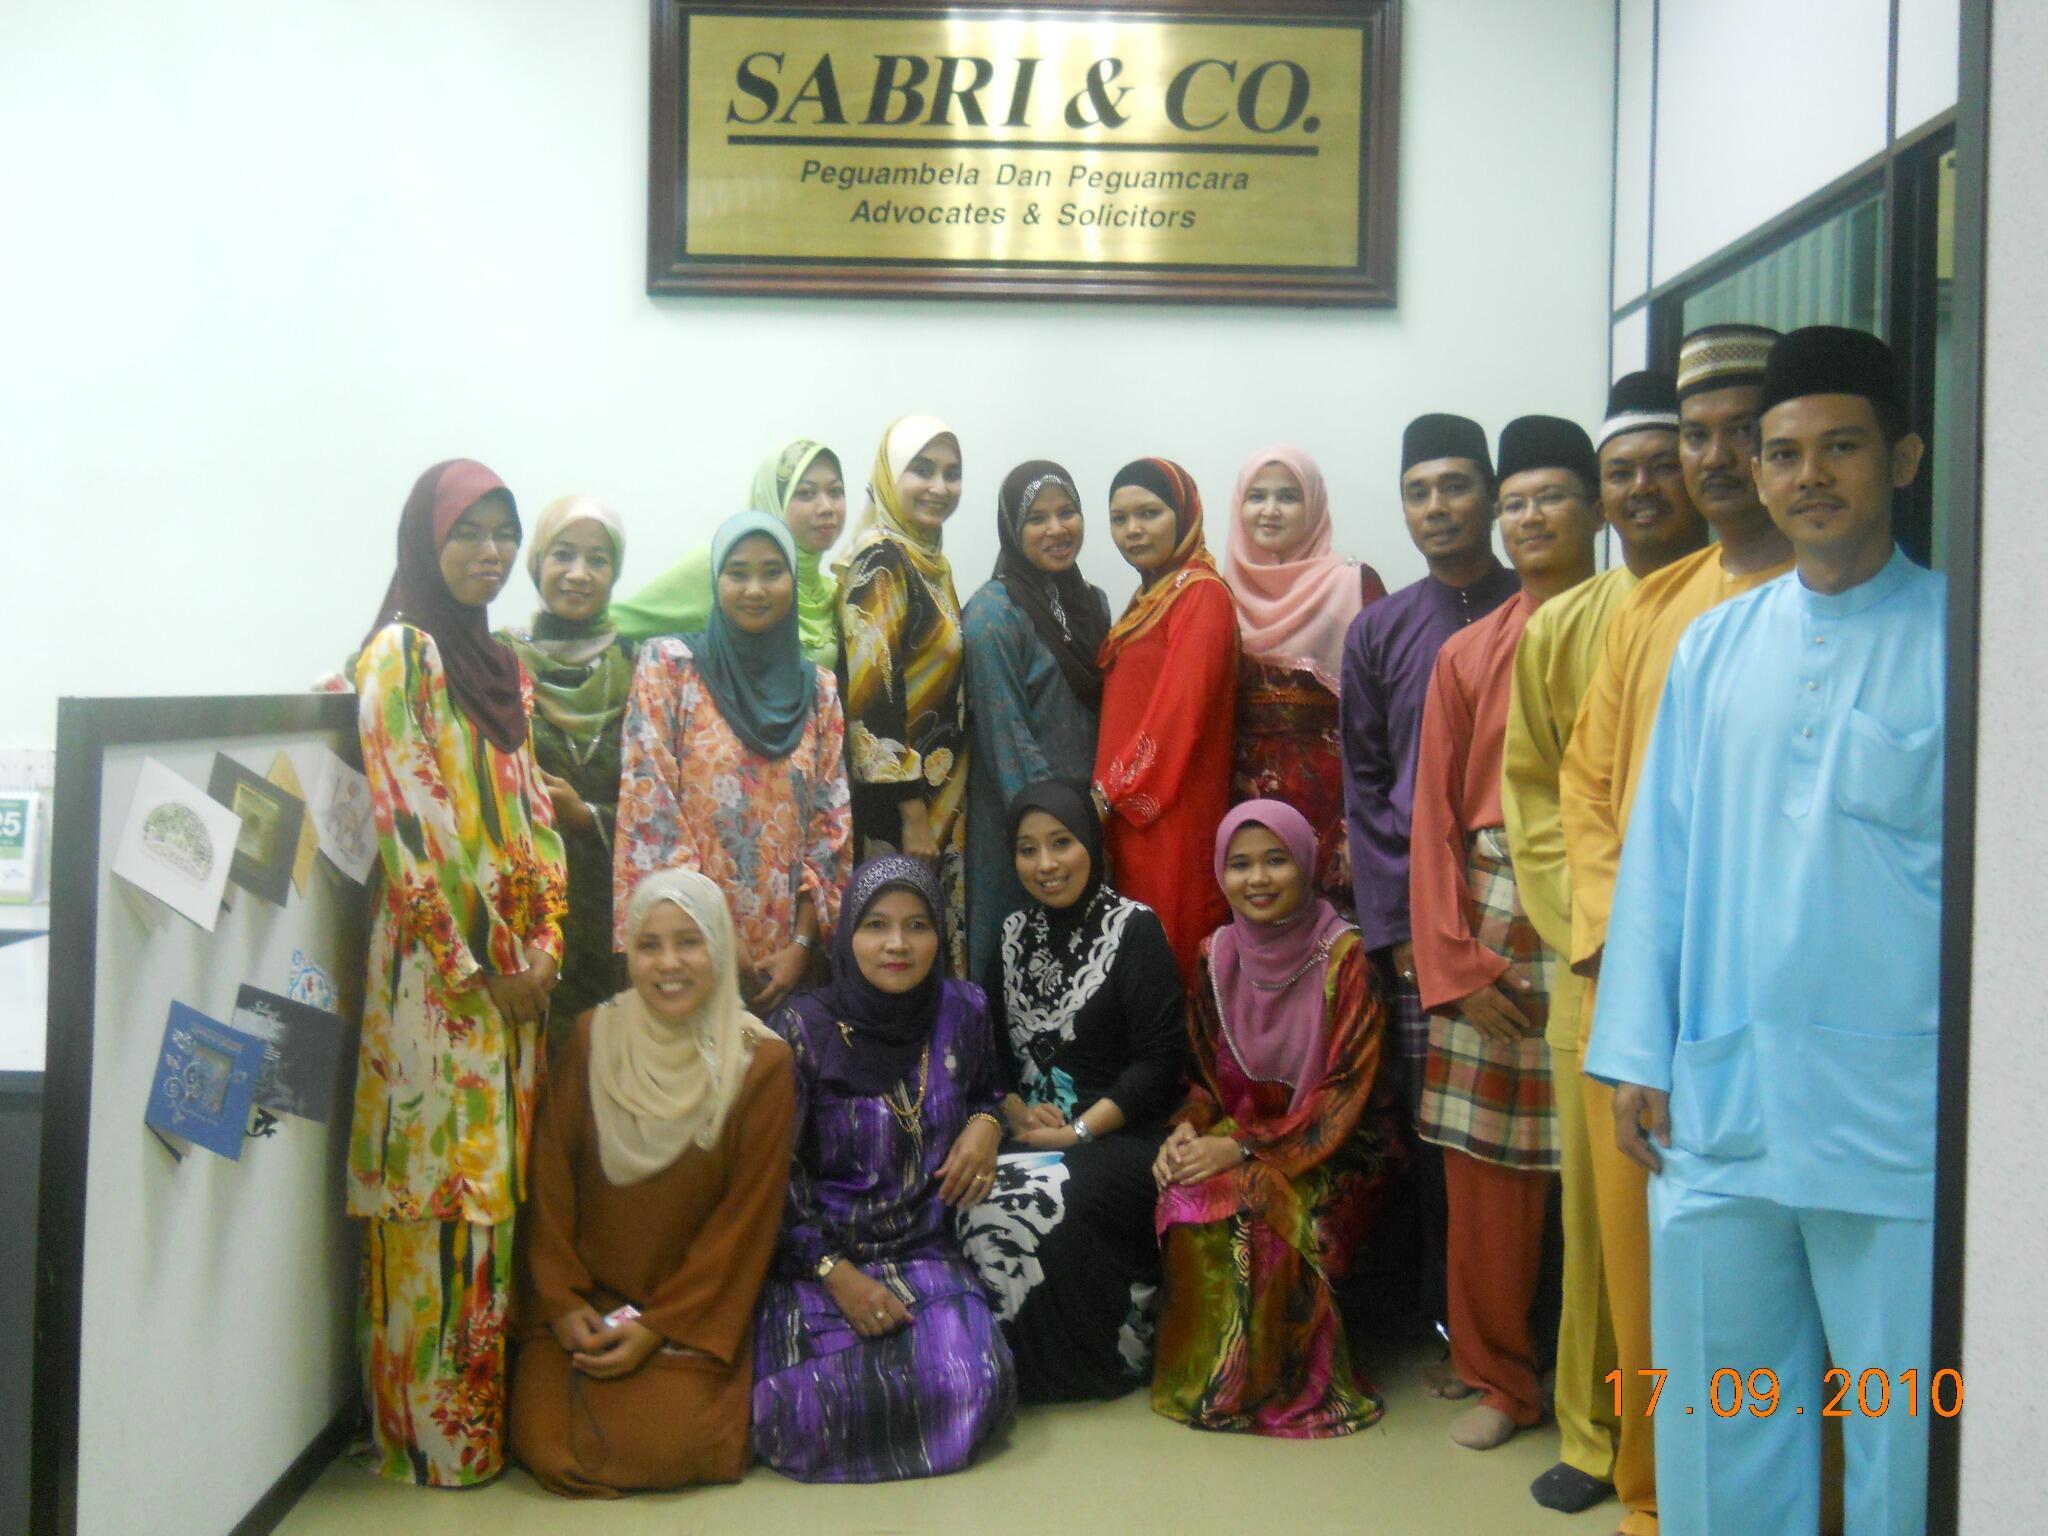 Raya 2010 di Opis Sabri & Co kepala Batas...hehehe http://t.co/ccbP8Vz1UY